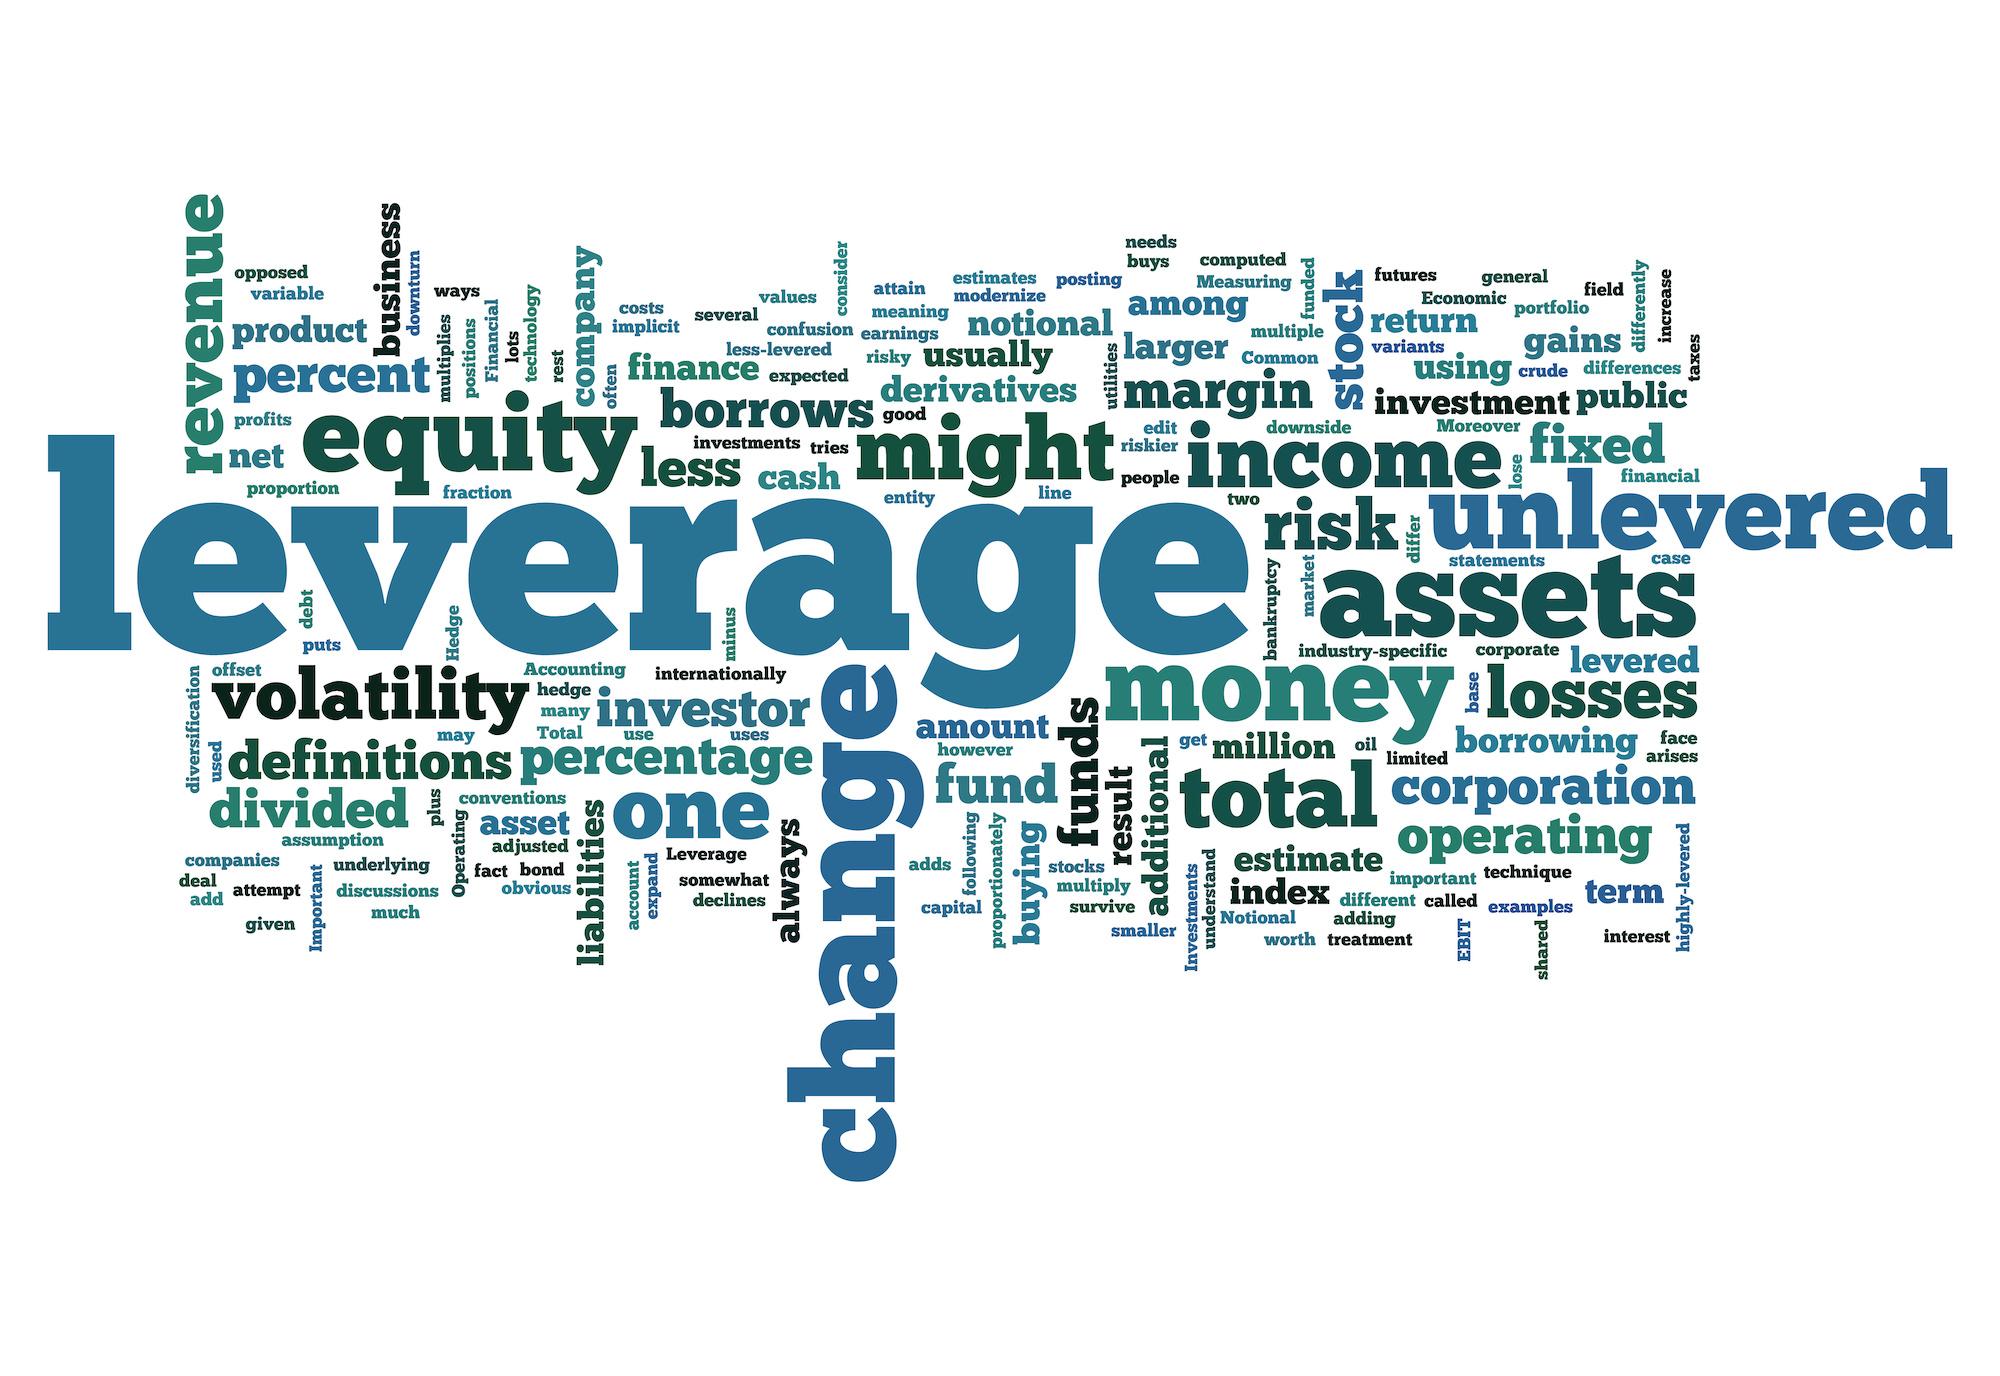 appraisal-ecomoncs-Third-Party-Valuation-Services